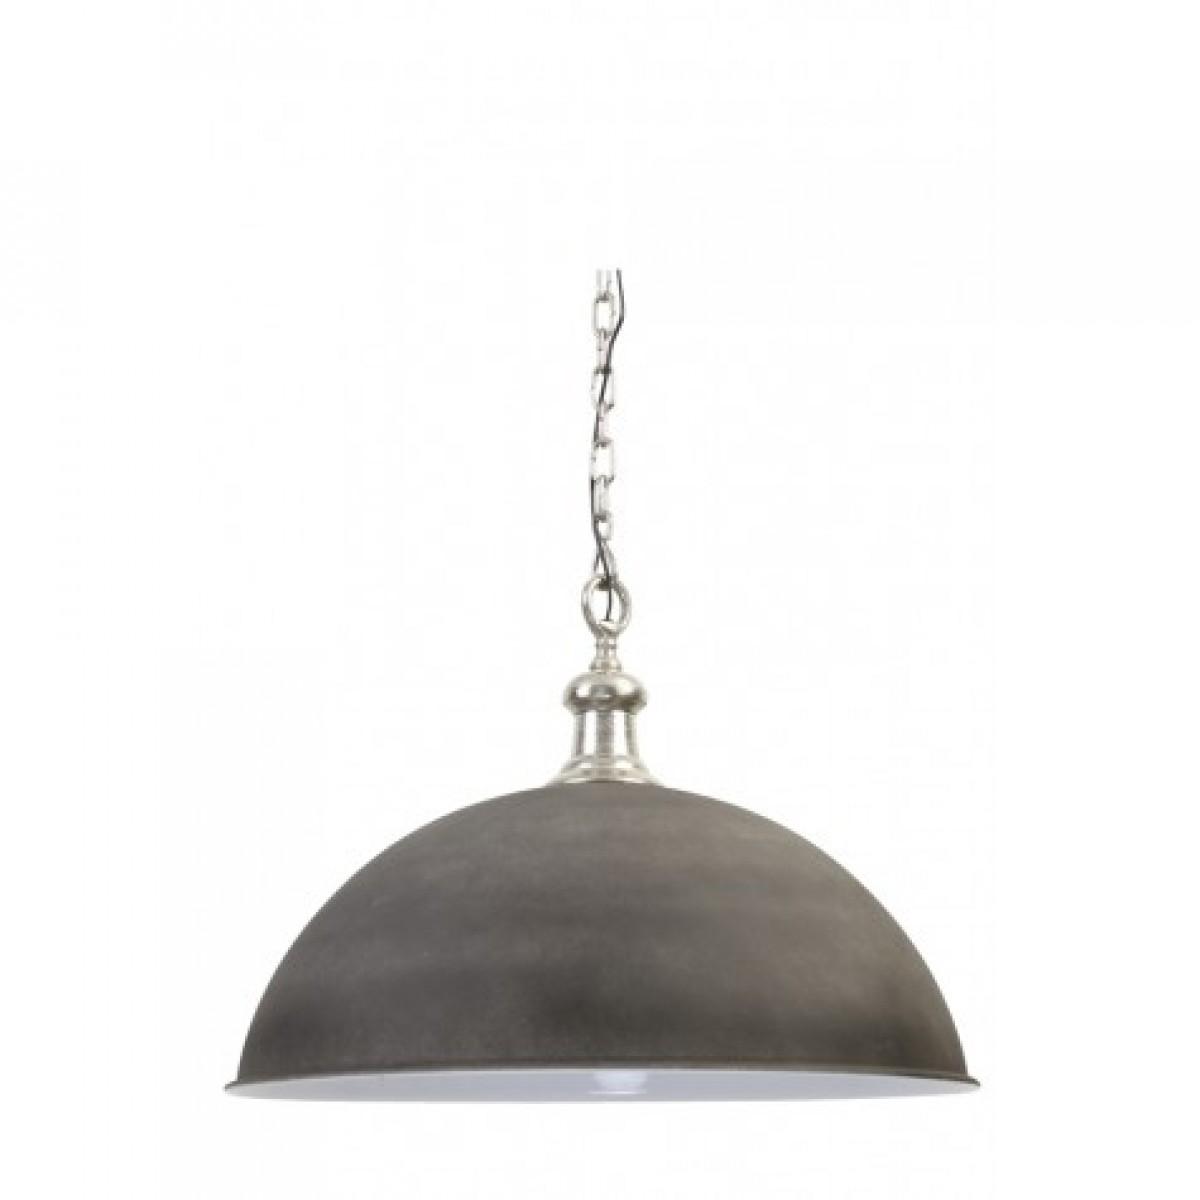 h ngeleuchte grau silber pendelleuchte silber durchmesser 70 cm. Black Bedroom Furniture Sets. Home Design Ideas